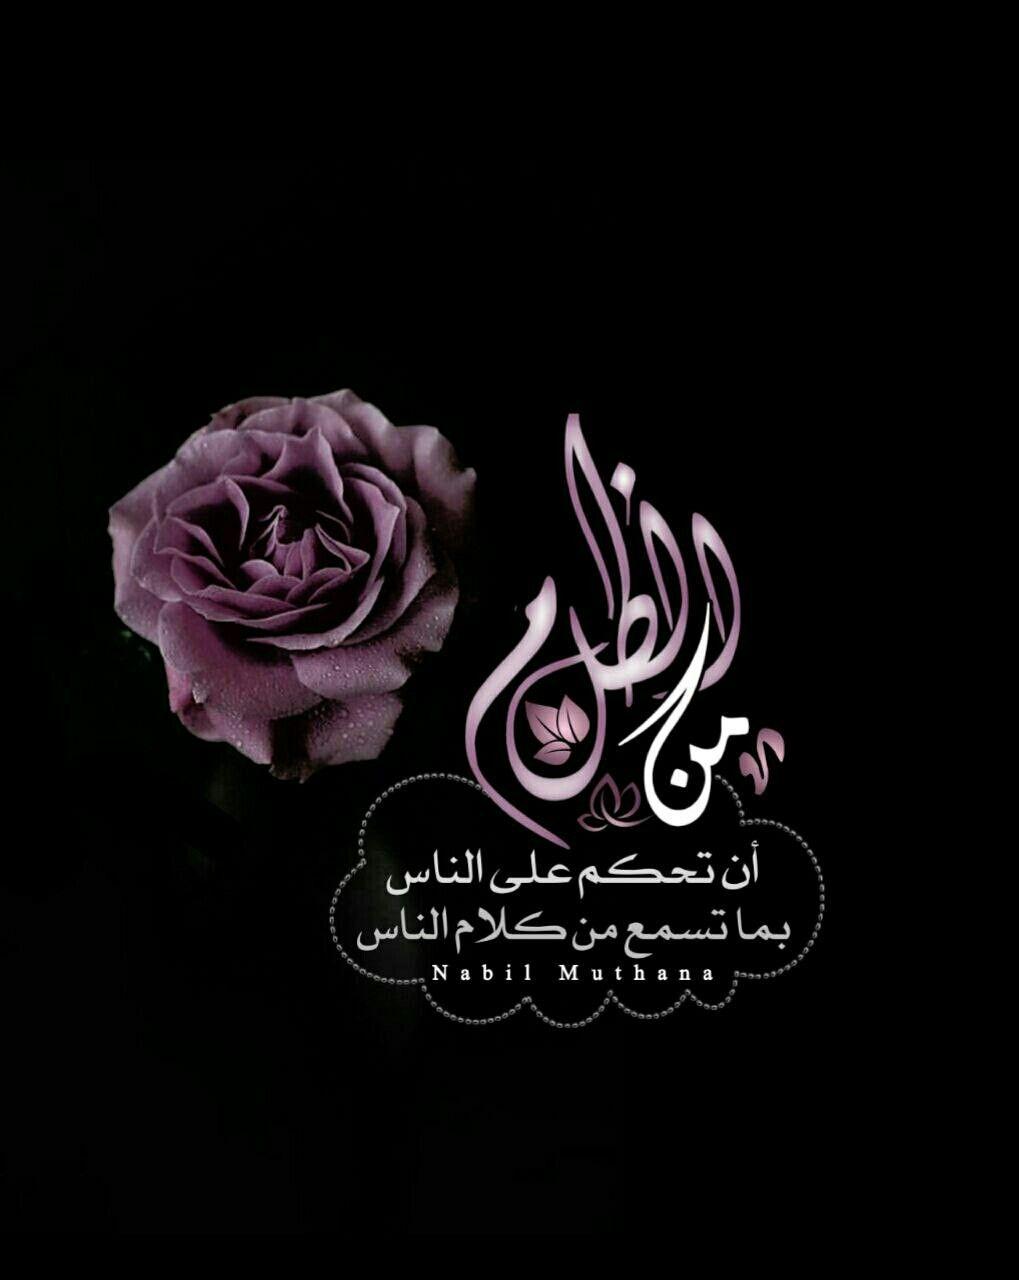 Pin By رحمة عبد الهادي On أجيب دعوة الداعي Arabic Arabic Calligraphy Calligraphy